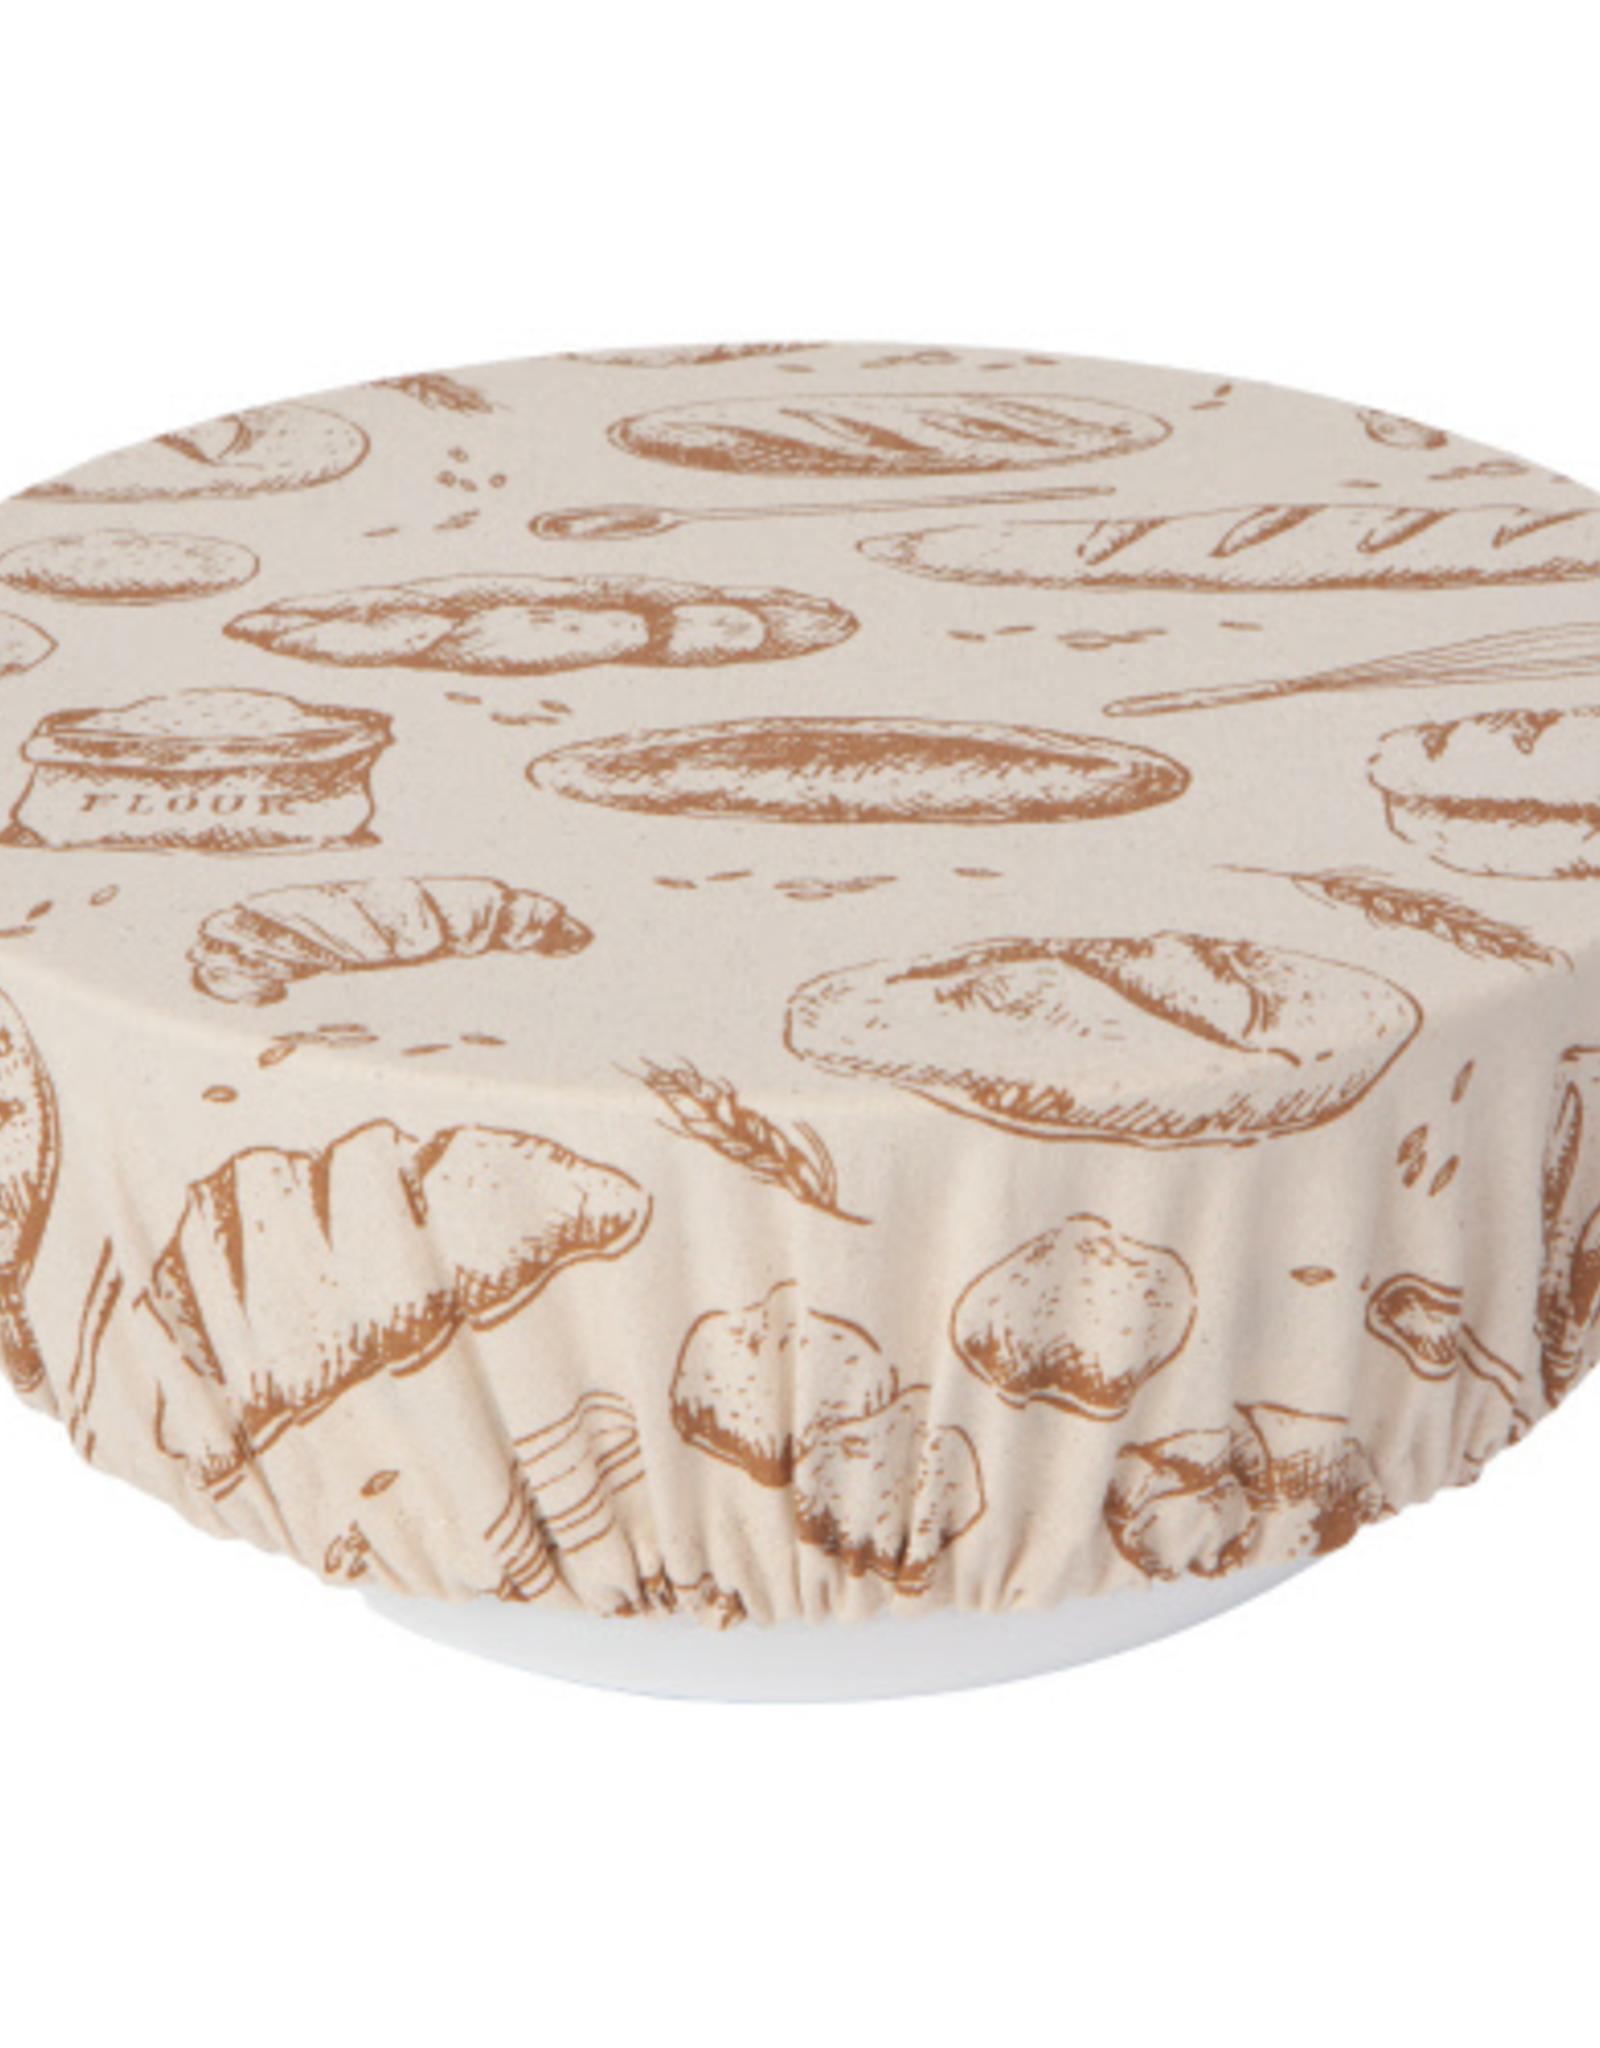 Danica Danica Fresh Baked Dough Riser